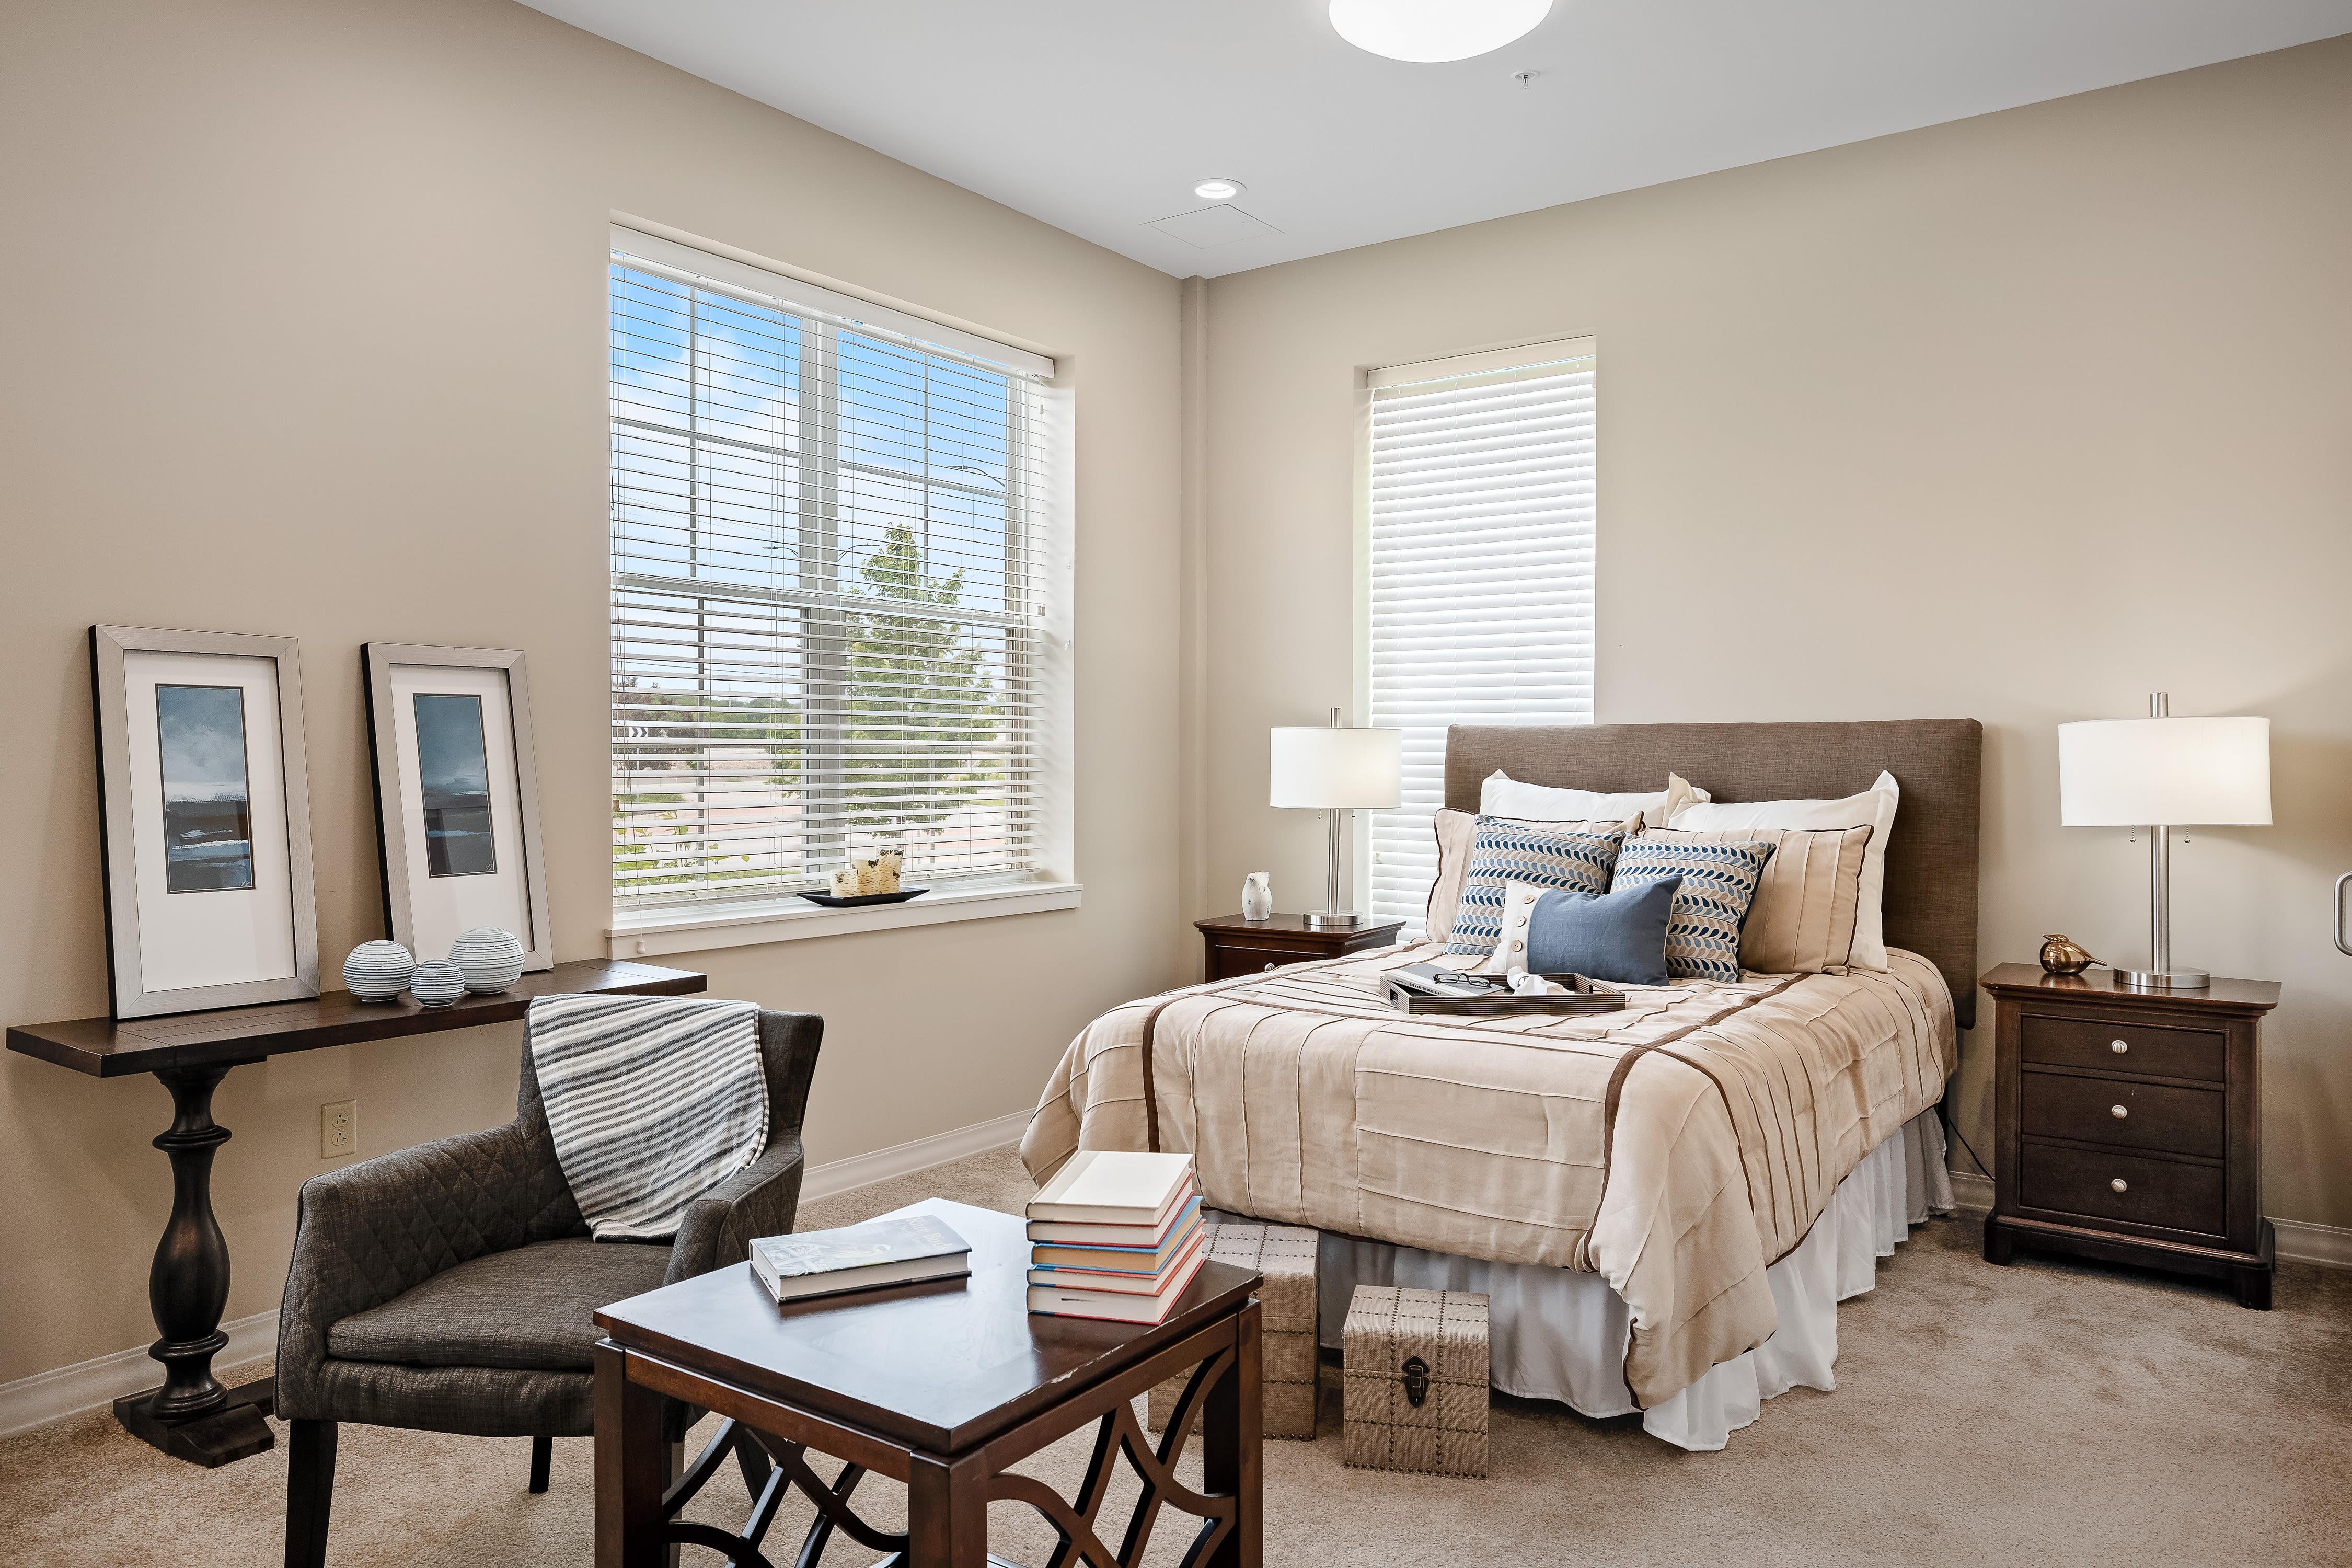 A sunny resident bedroom at Anthology of Overland Park in Overland Park, Kansas